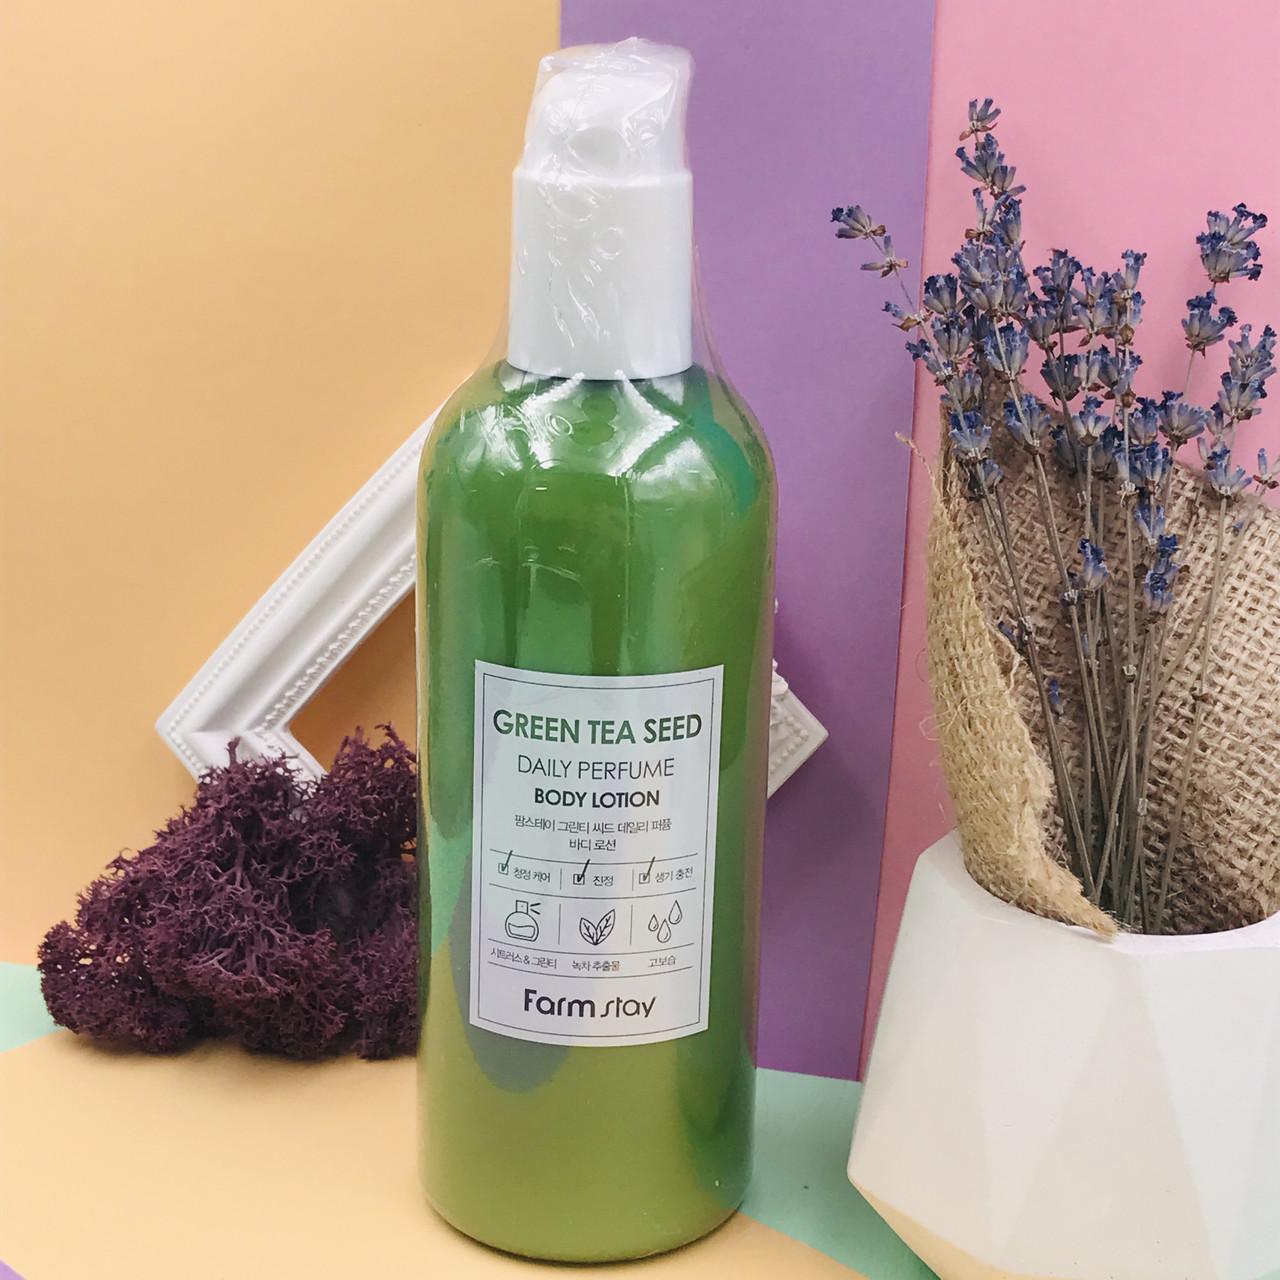 Парфюмированный лосьон для тела FARM STAY с экстрактом семян зеленого чая Green Tea Seed Daily Perfume Body